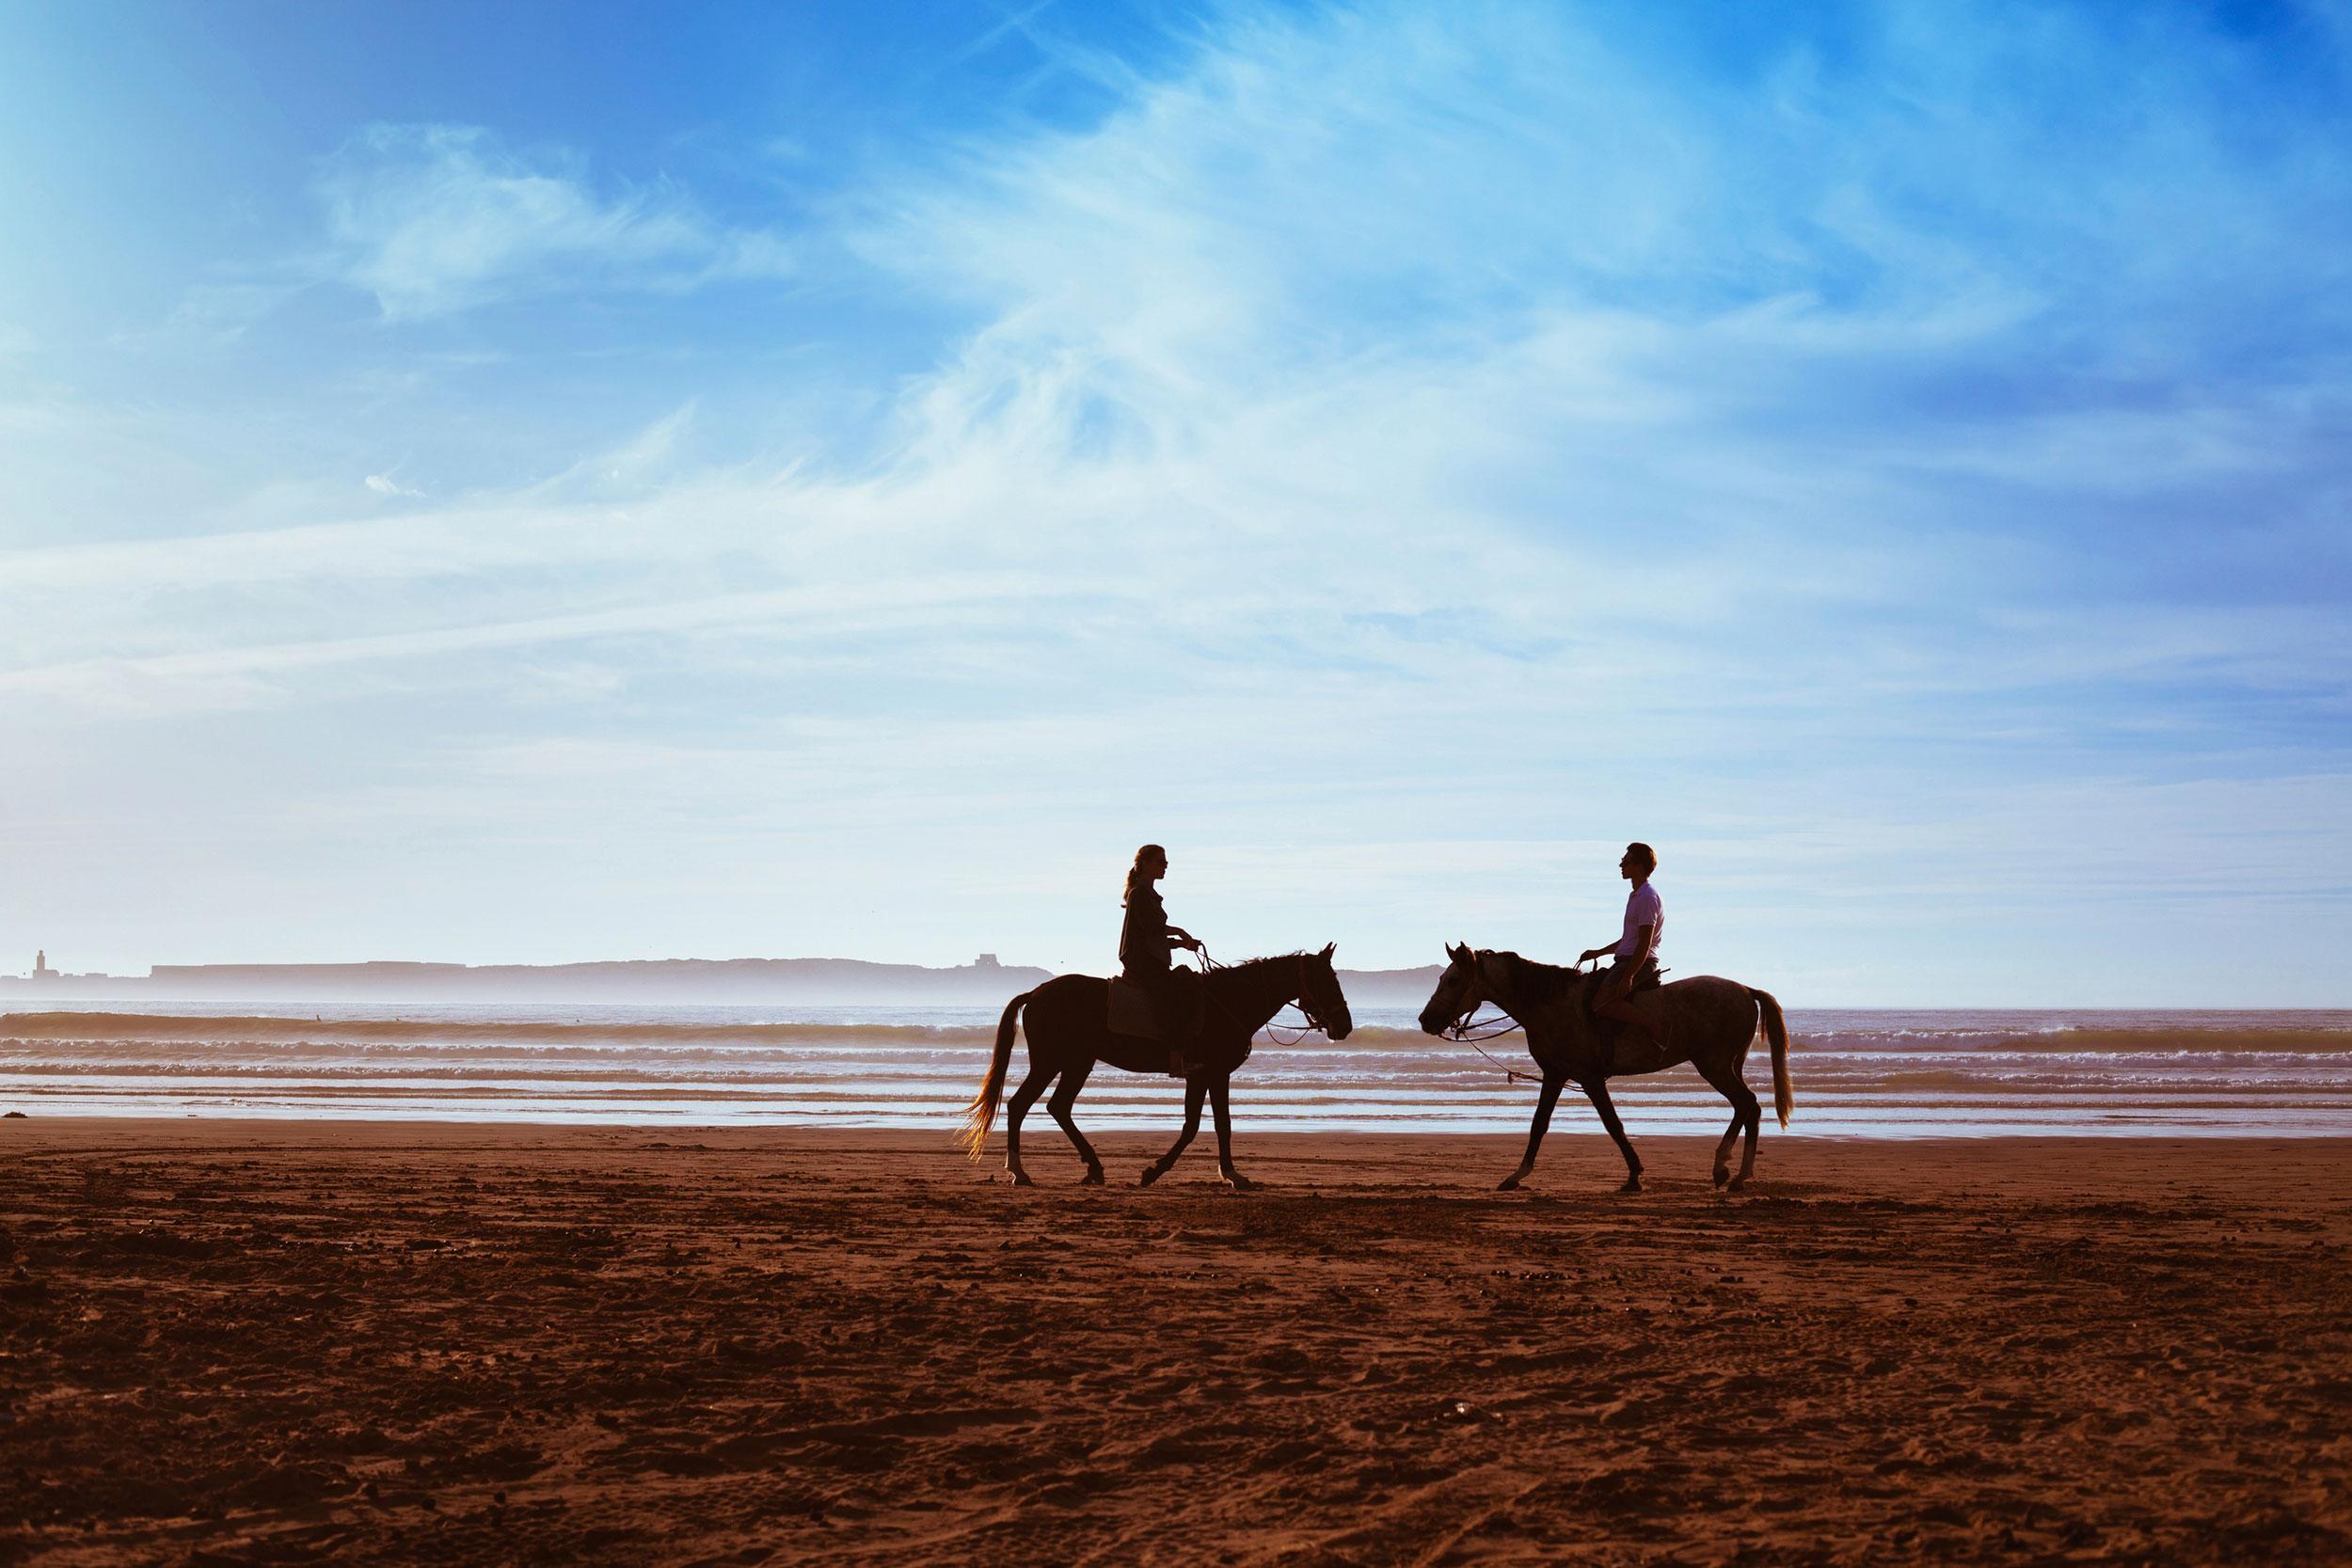 The Four Horsemen Criticism Contempt Defensiveness And